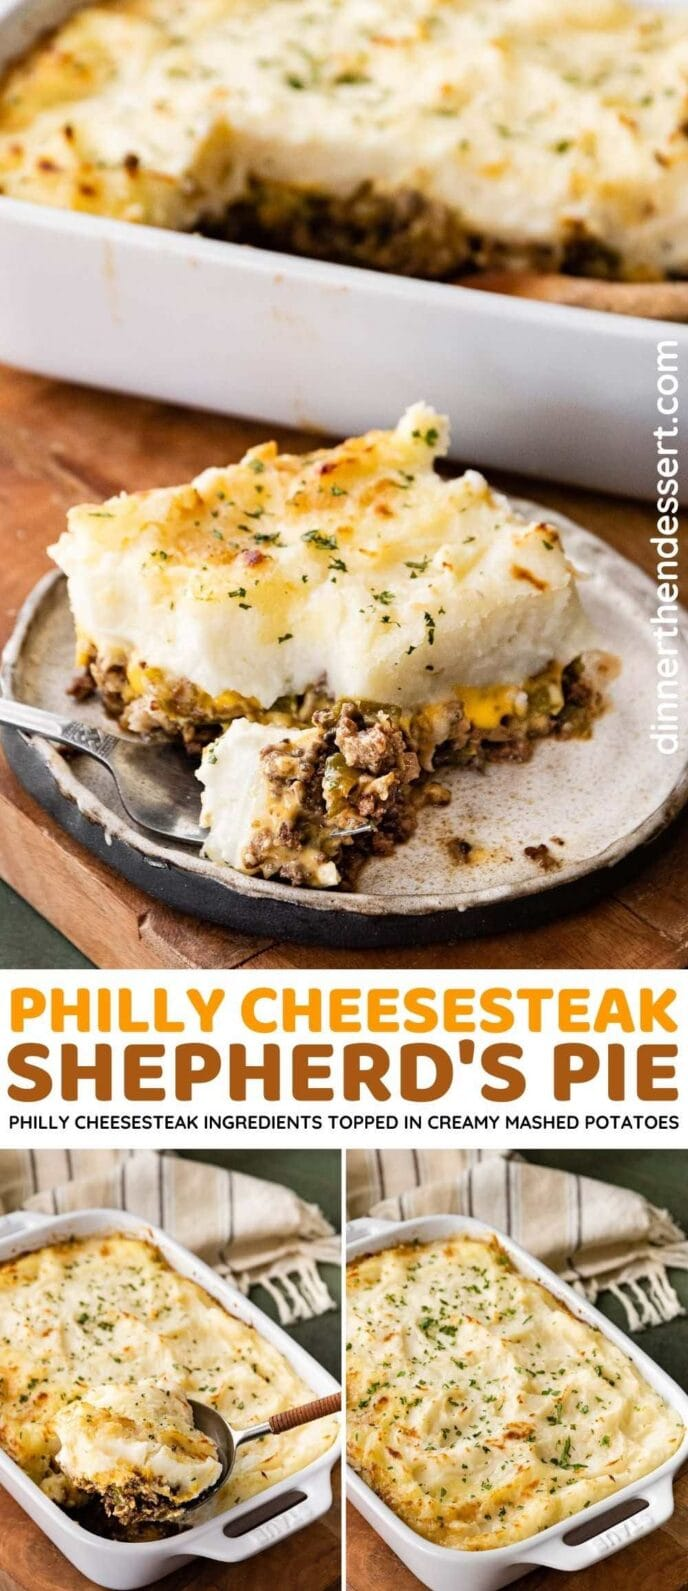 Philly Cheesesteak Shepherd's Pie